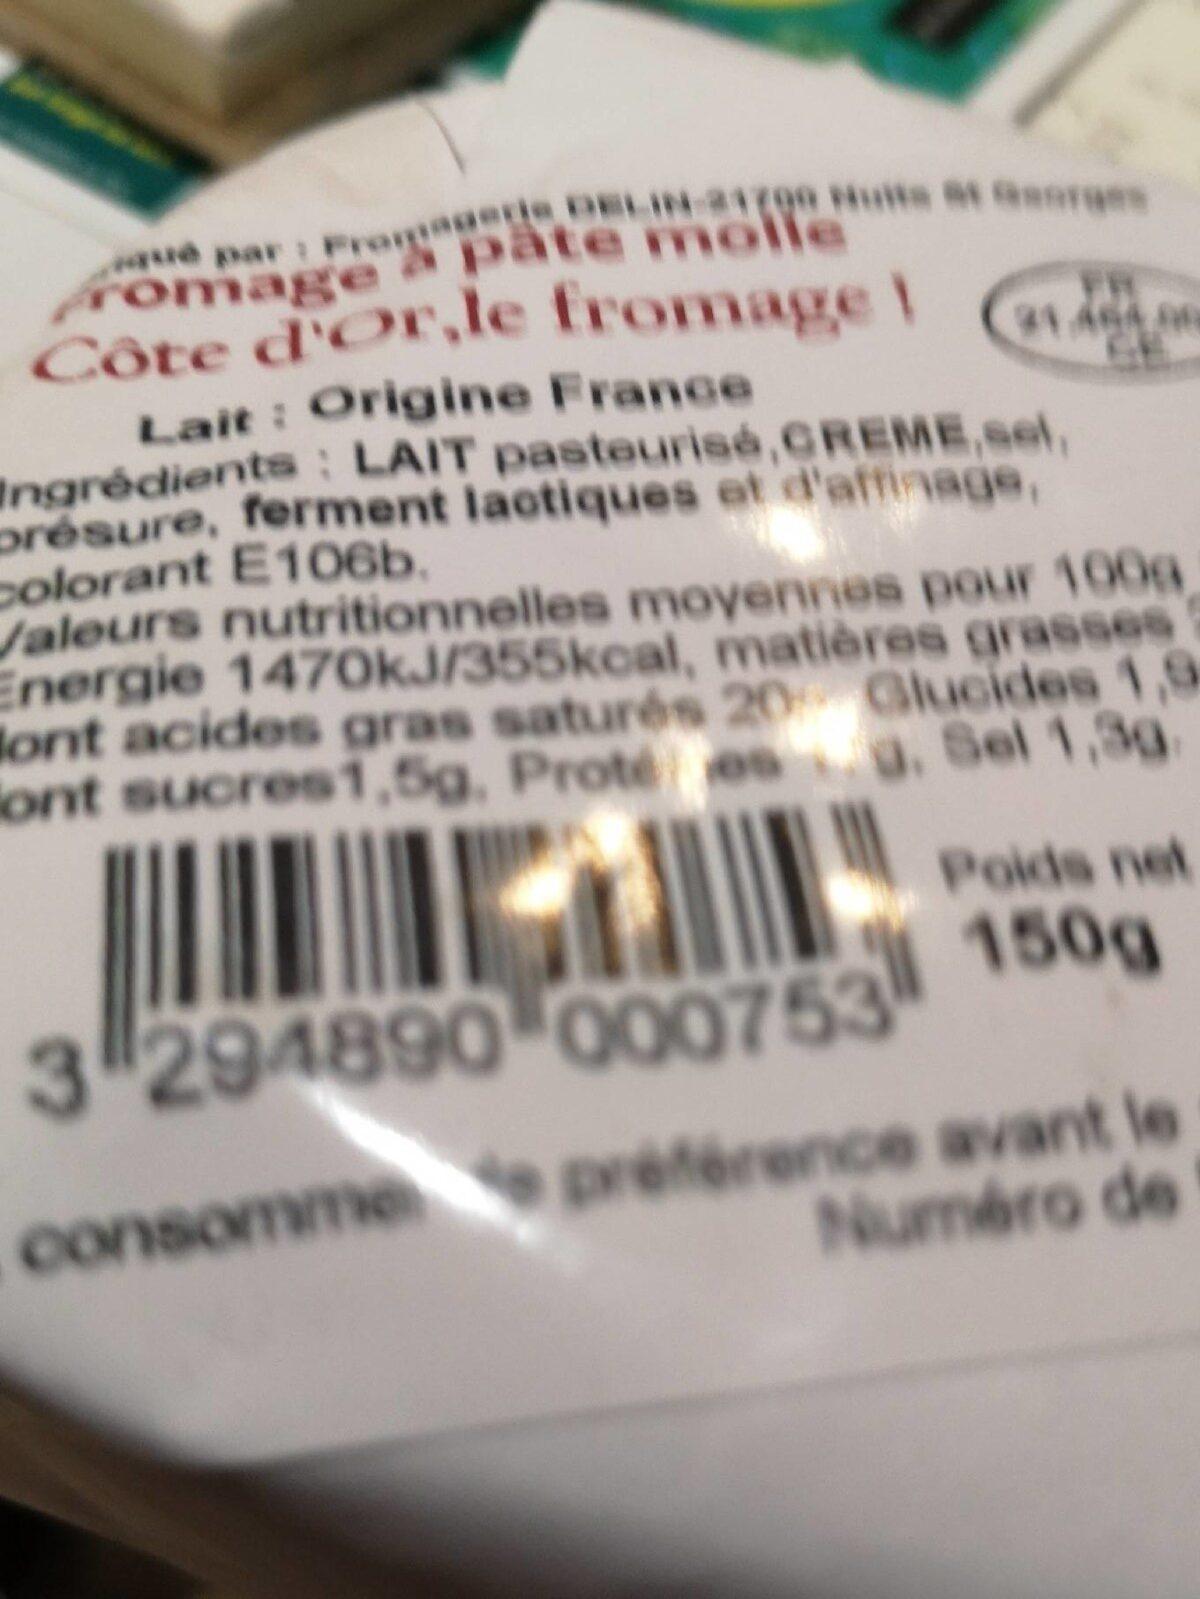 Cote d'or fromage à pâte molle - Nutrition facts - fr